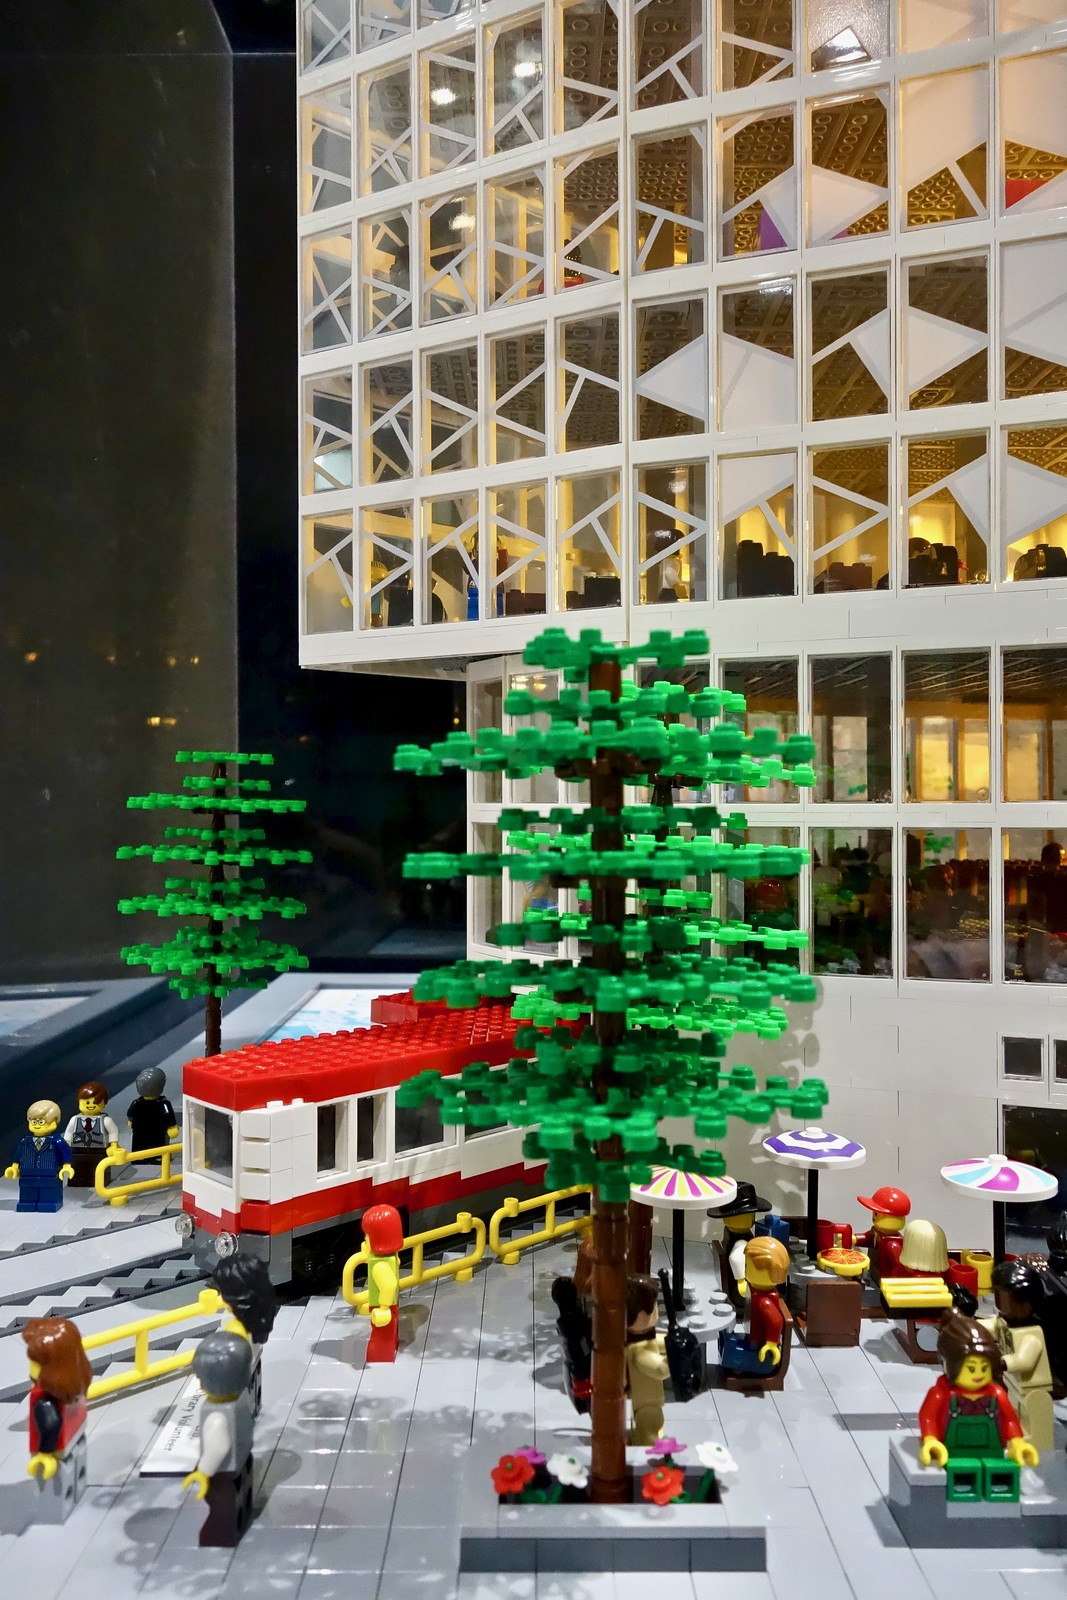 Lego library, Calgary, Alberta, Canada